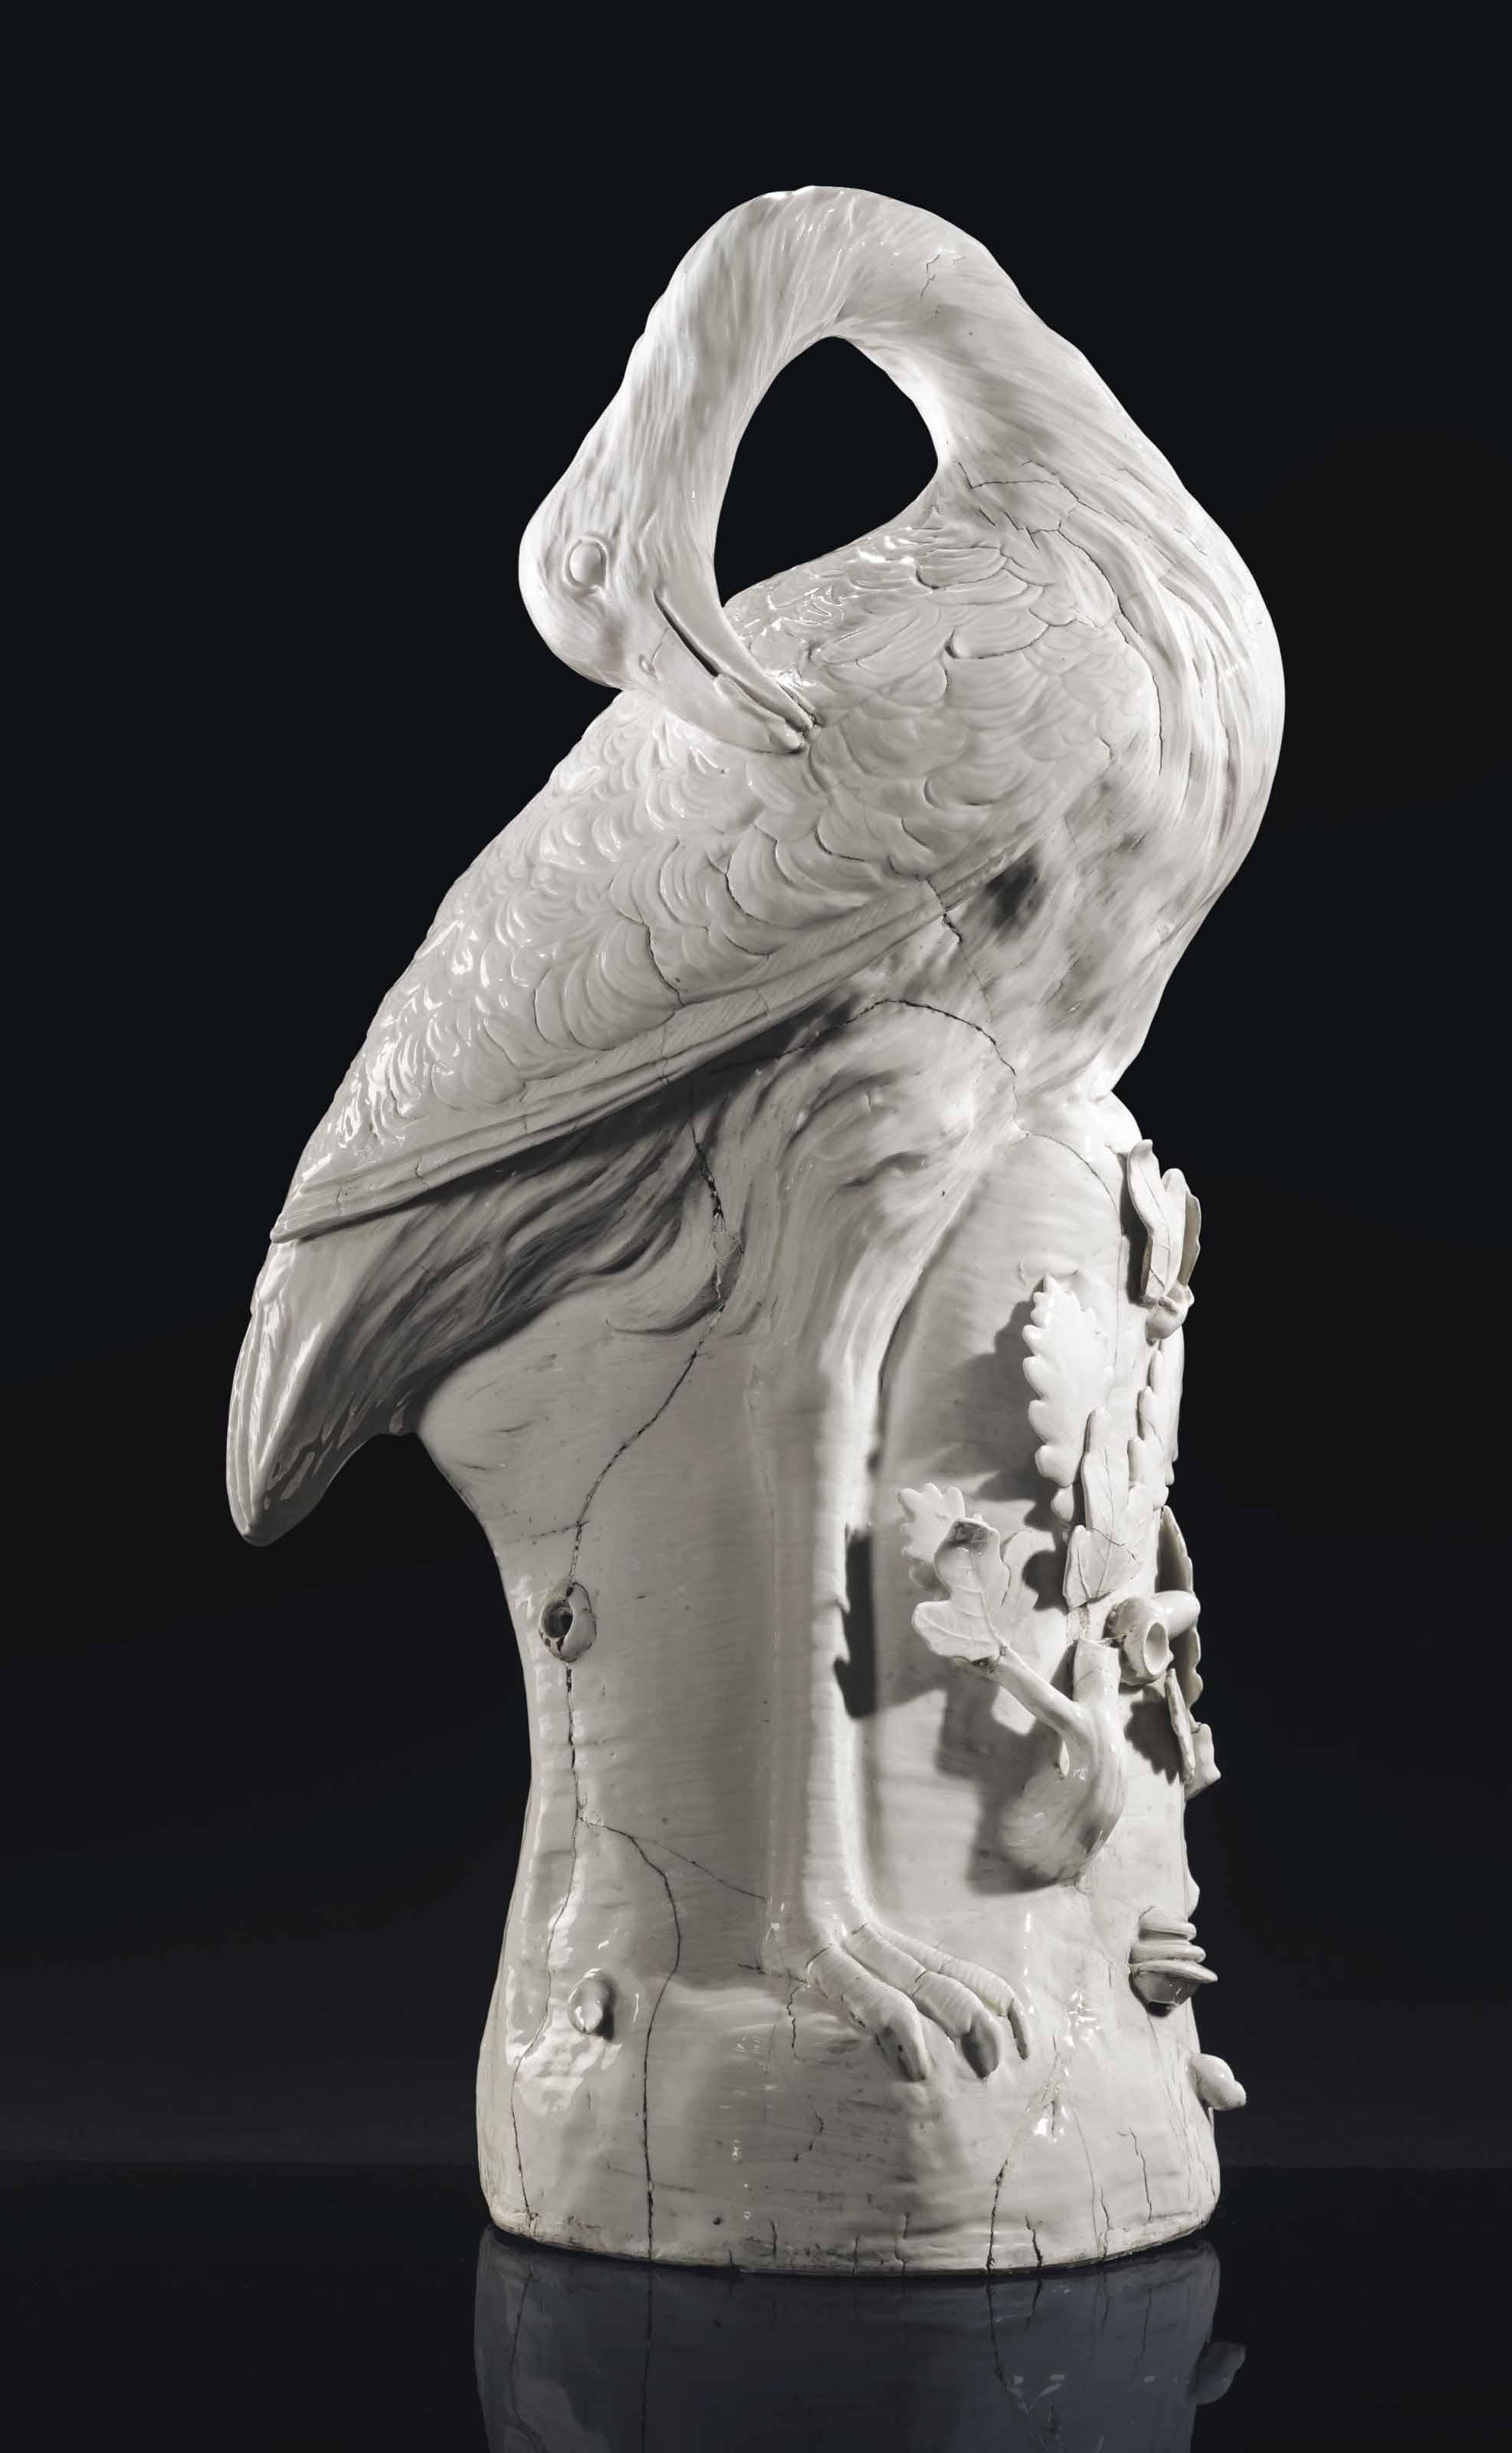 A MEISSEN WHITE MODEL OF A GREAT BUSTARD (OTIS TARDA)